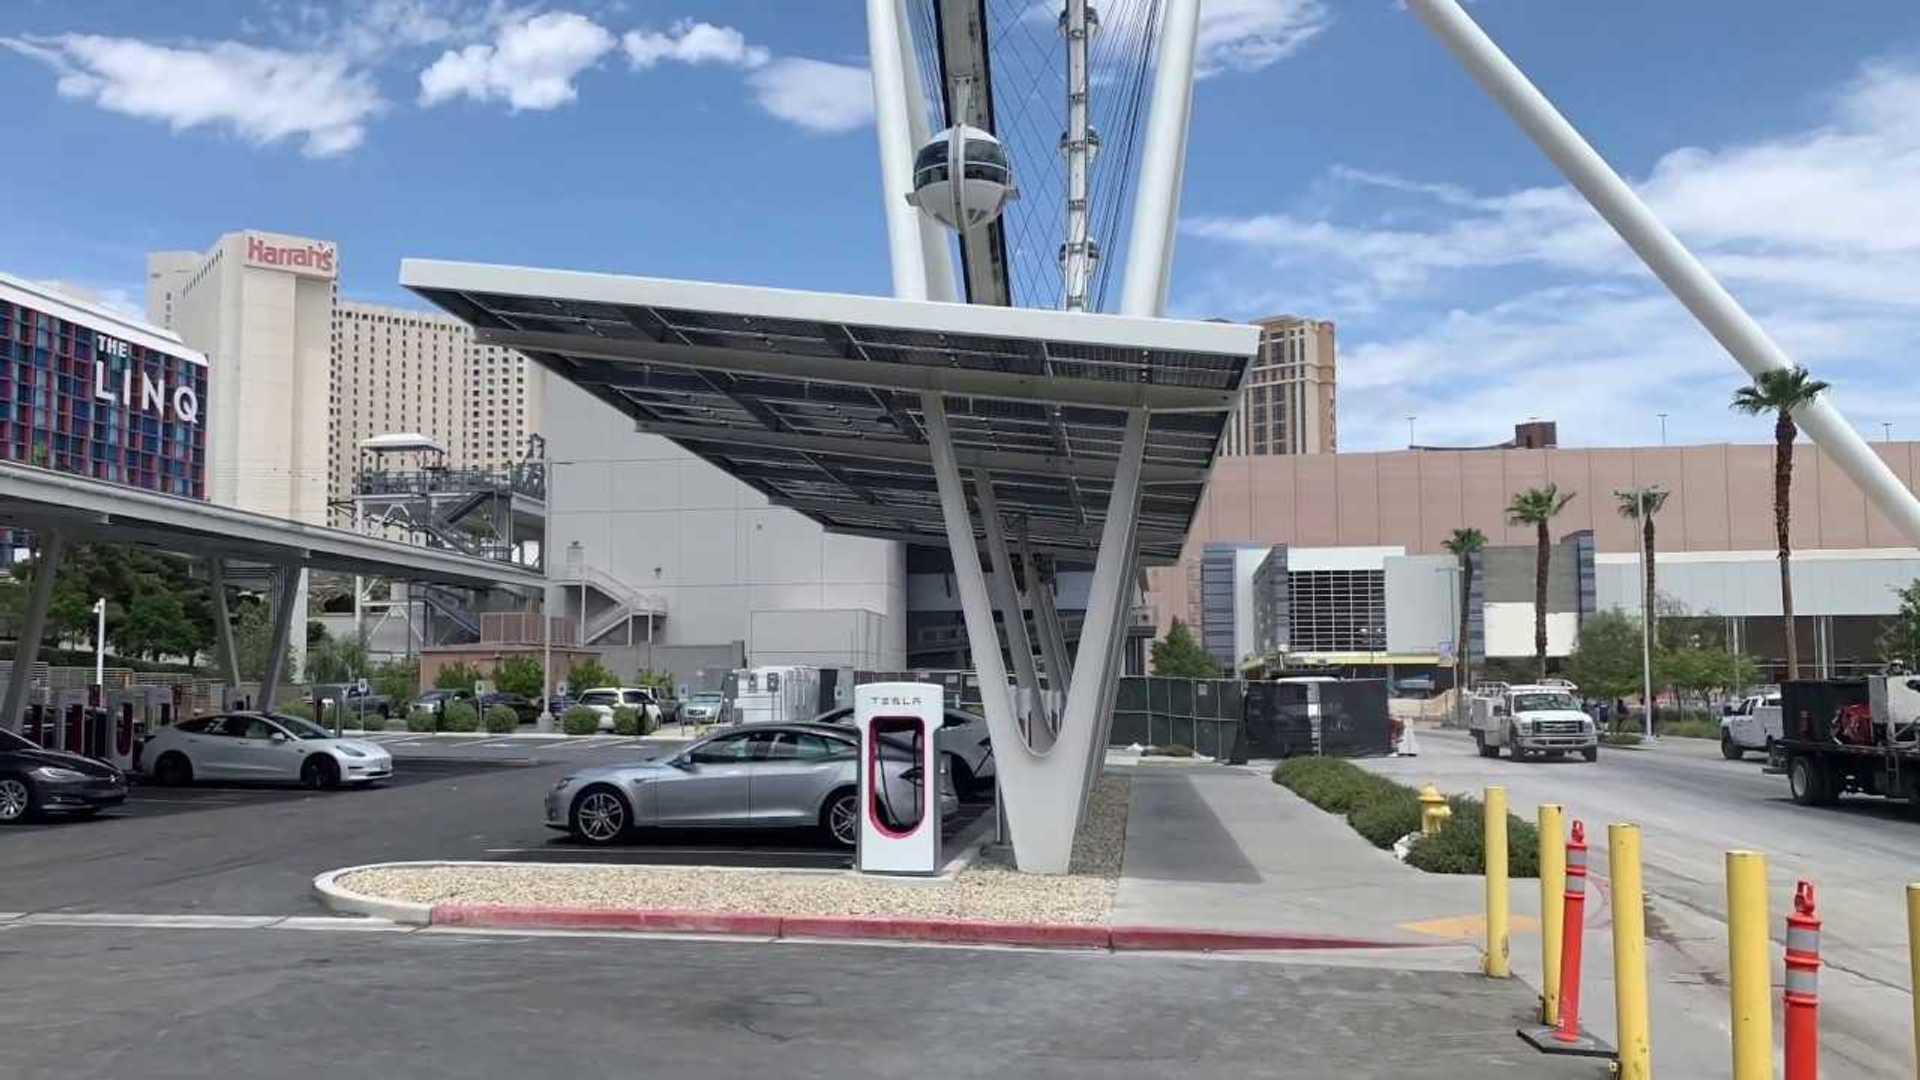 250 kW Tesla Model 3 Supercharging Demonstrated In Las Vegas: Video